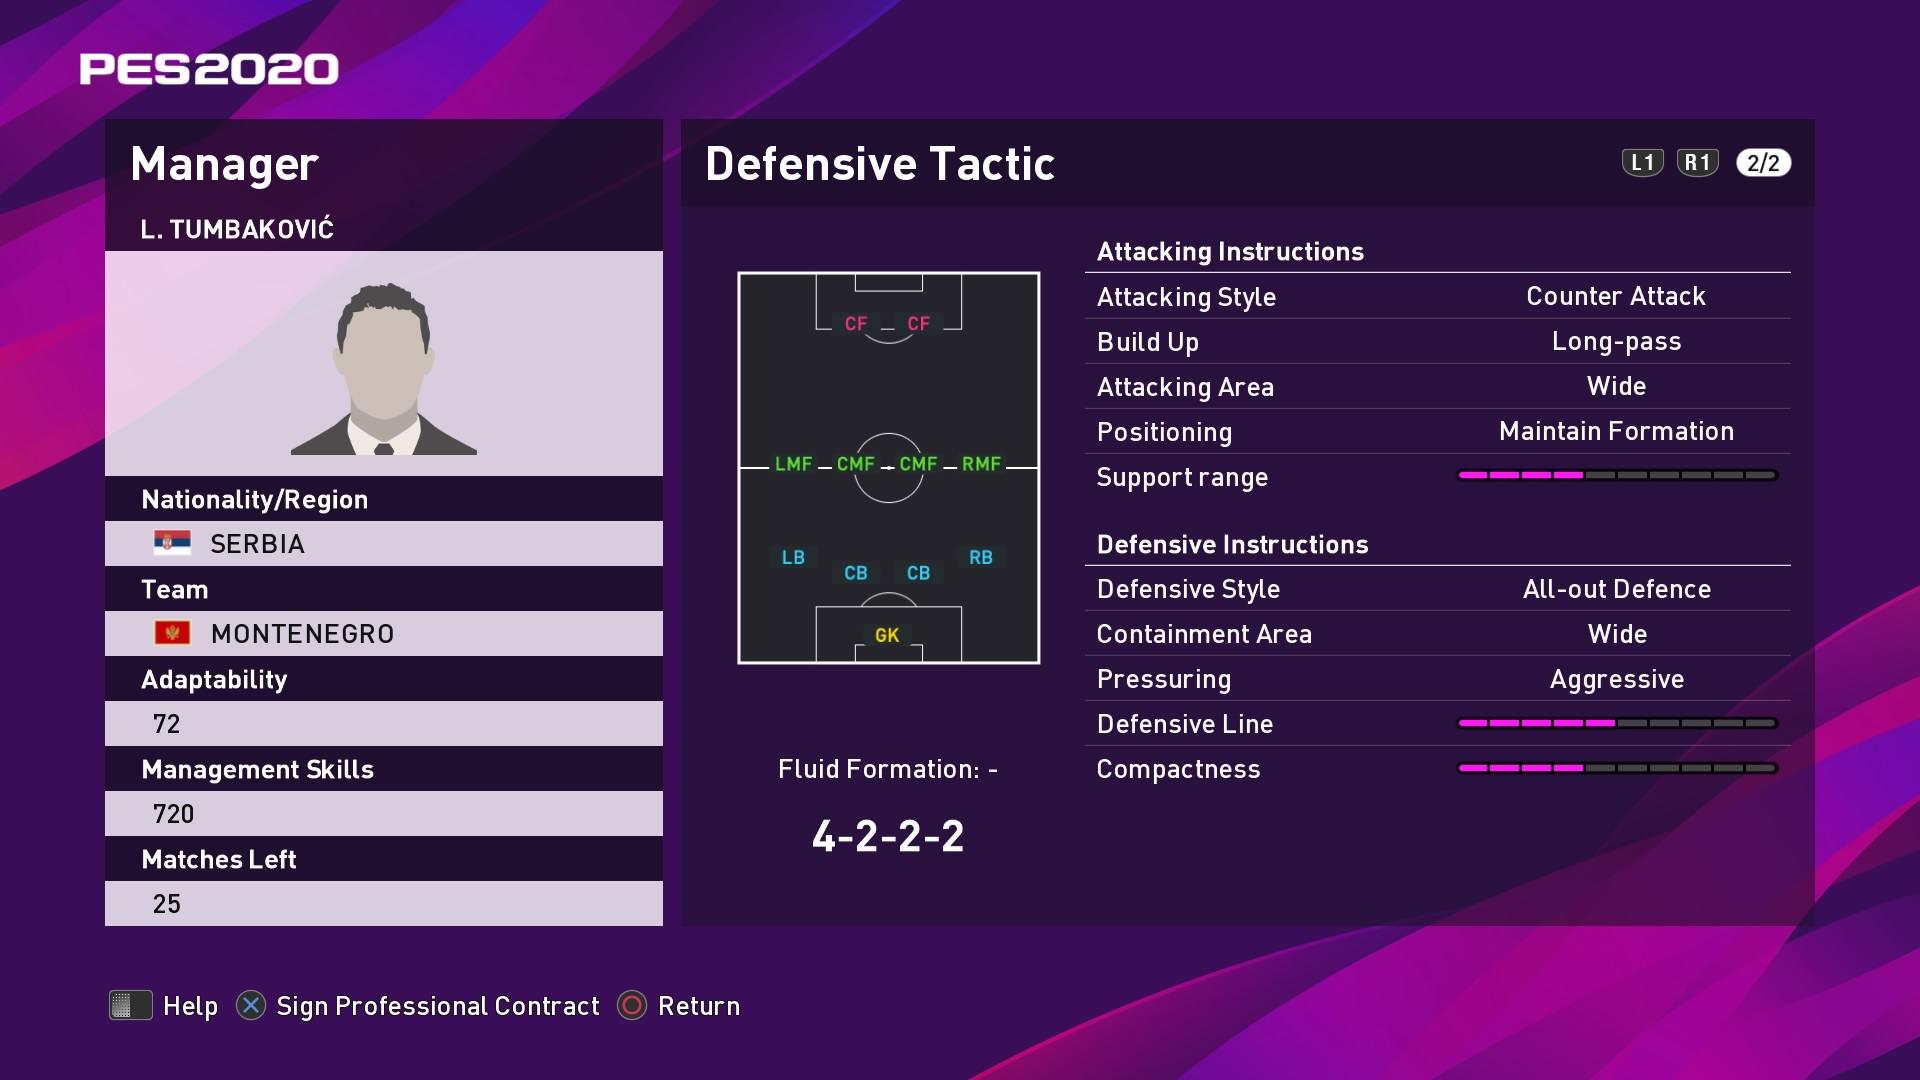 L. Tumbaković (Ljubisa Tumbaković) Defensive Tactic in PES 2020 myClub